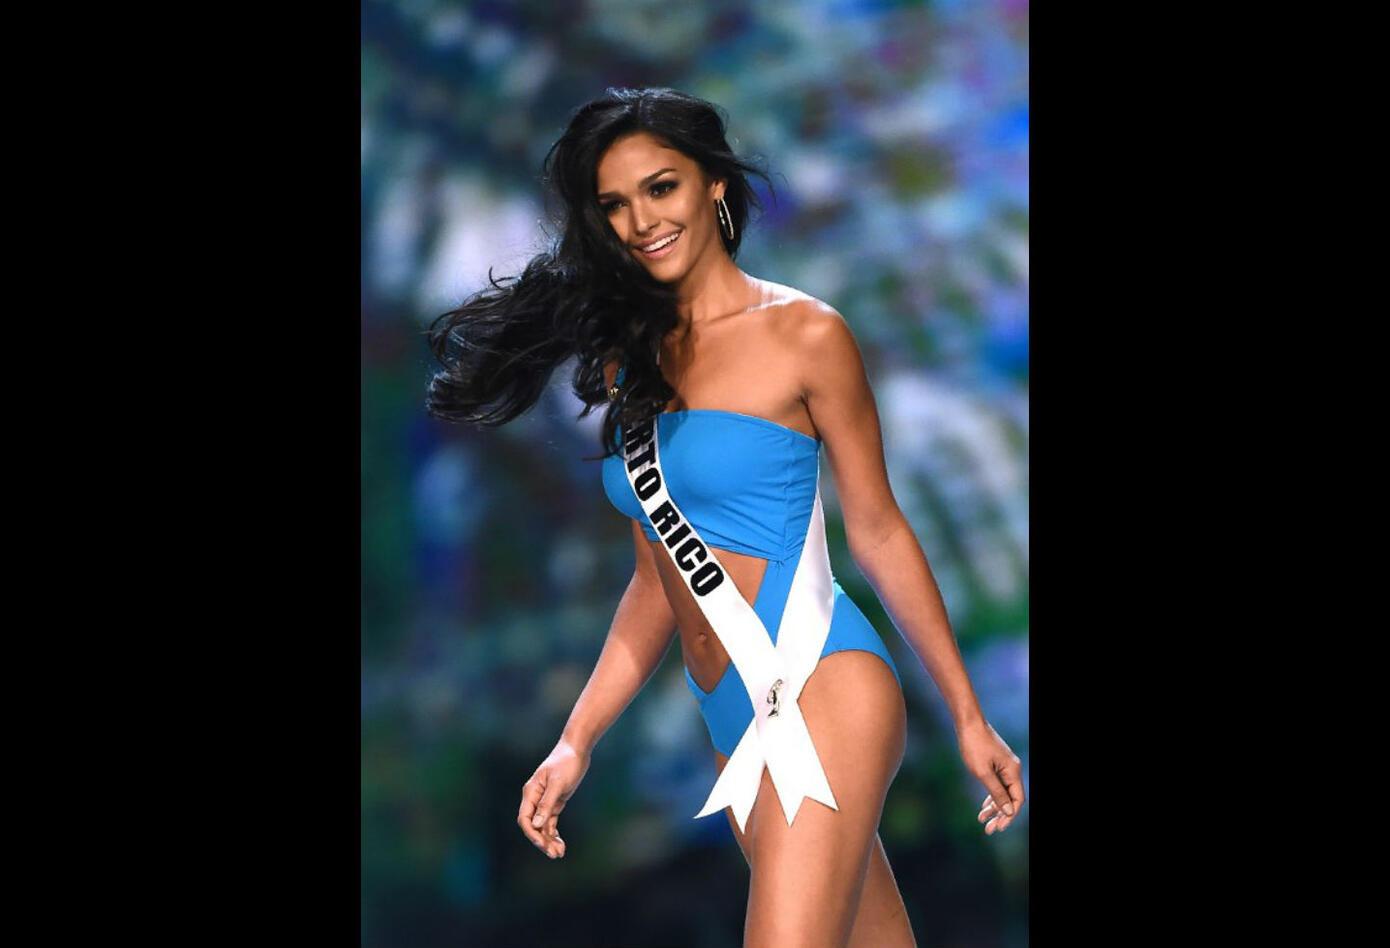 Miss Puerto Rico, Kiara Ortega